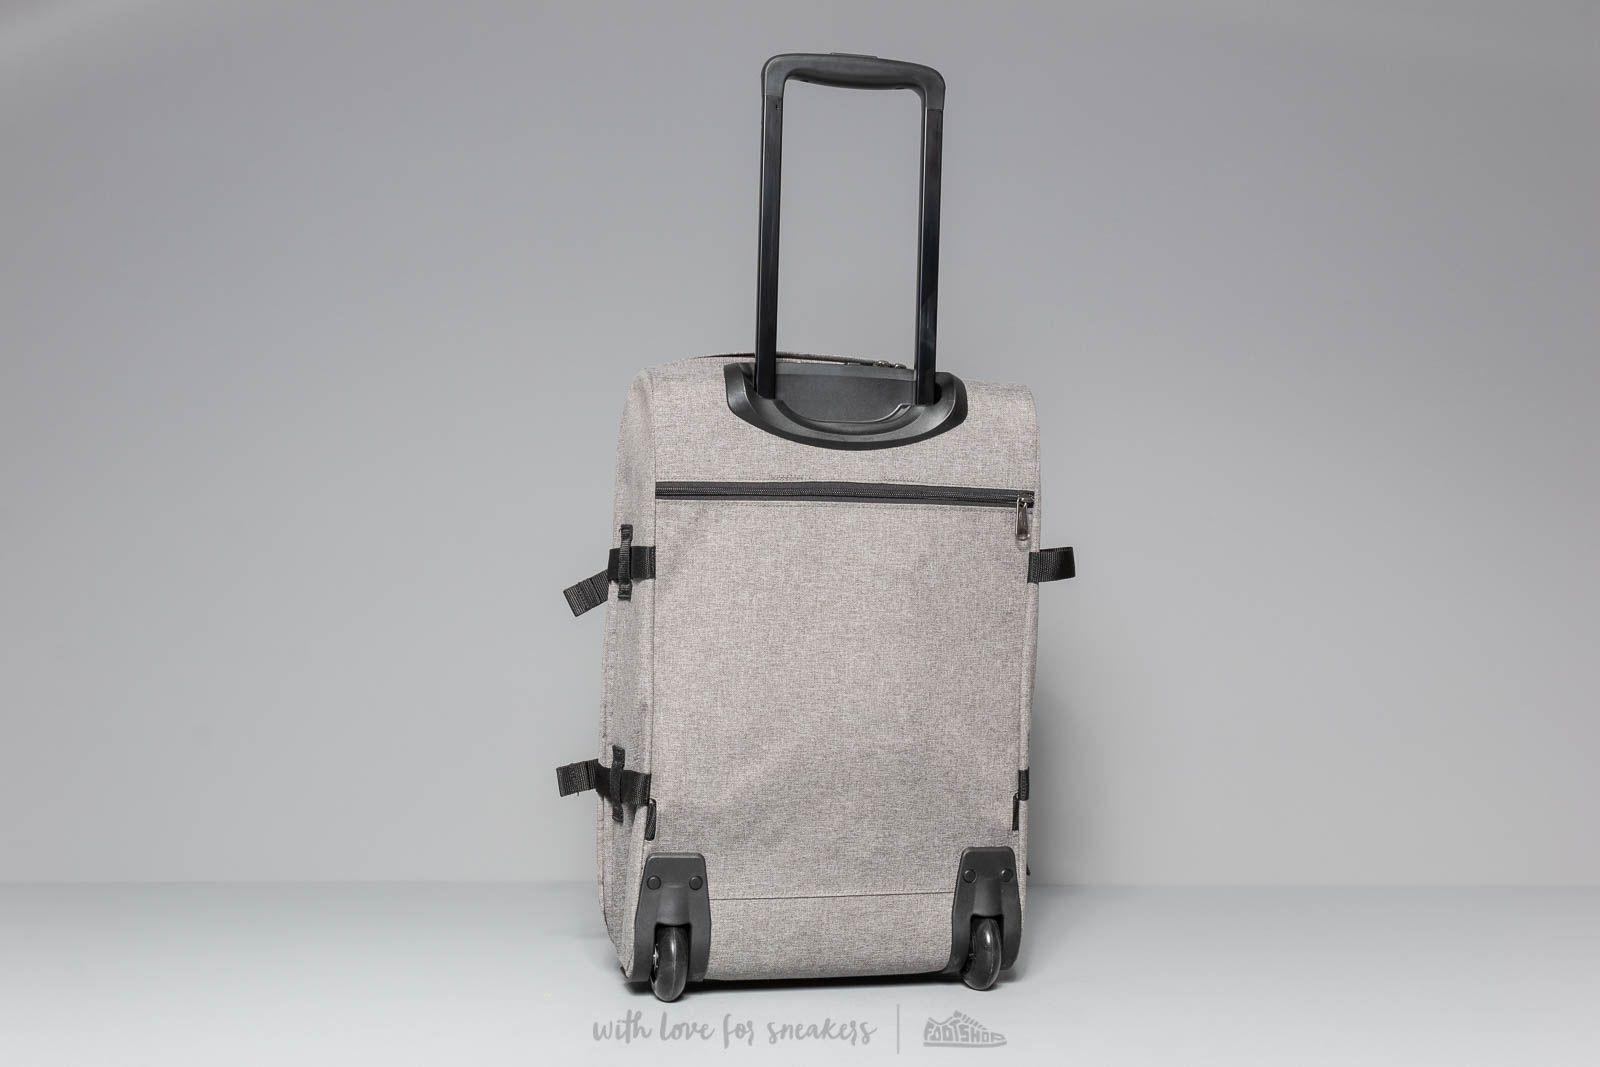 f1065bce6 Eastpak Core Strapverz Travel Bag Sunday Grey la un preț excelent 662 Lei  cumpără la Footshop